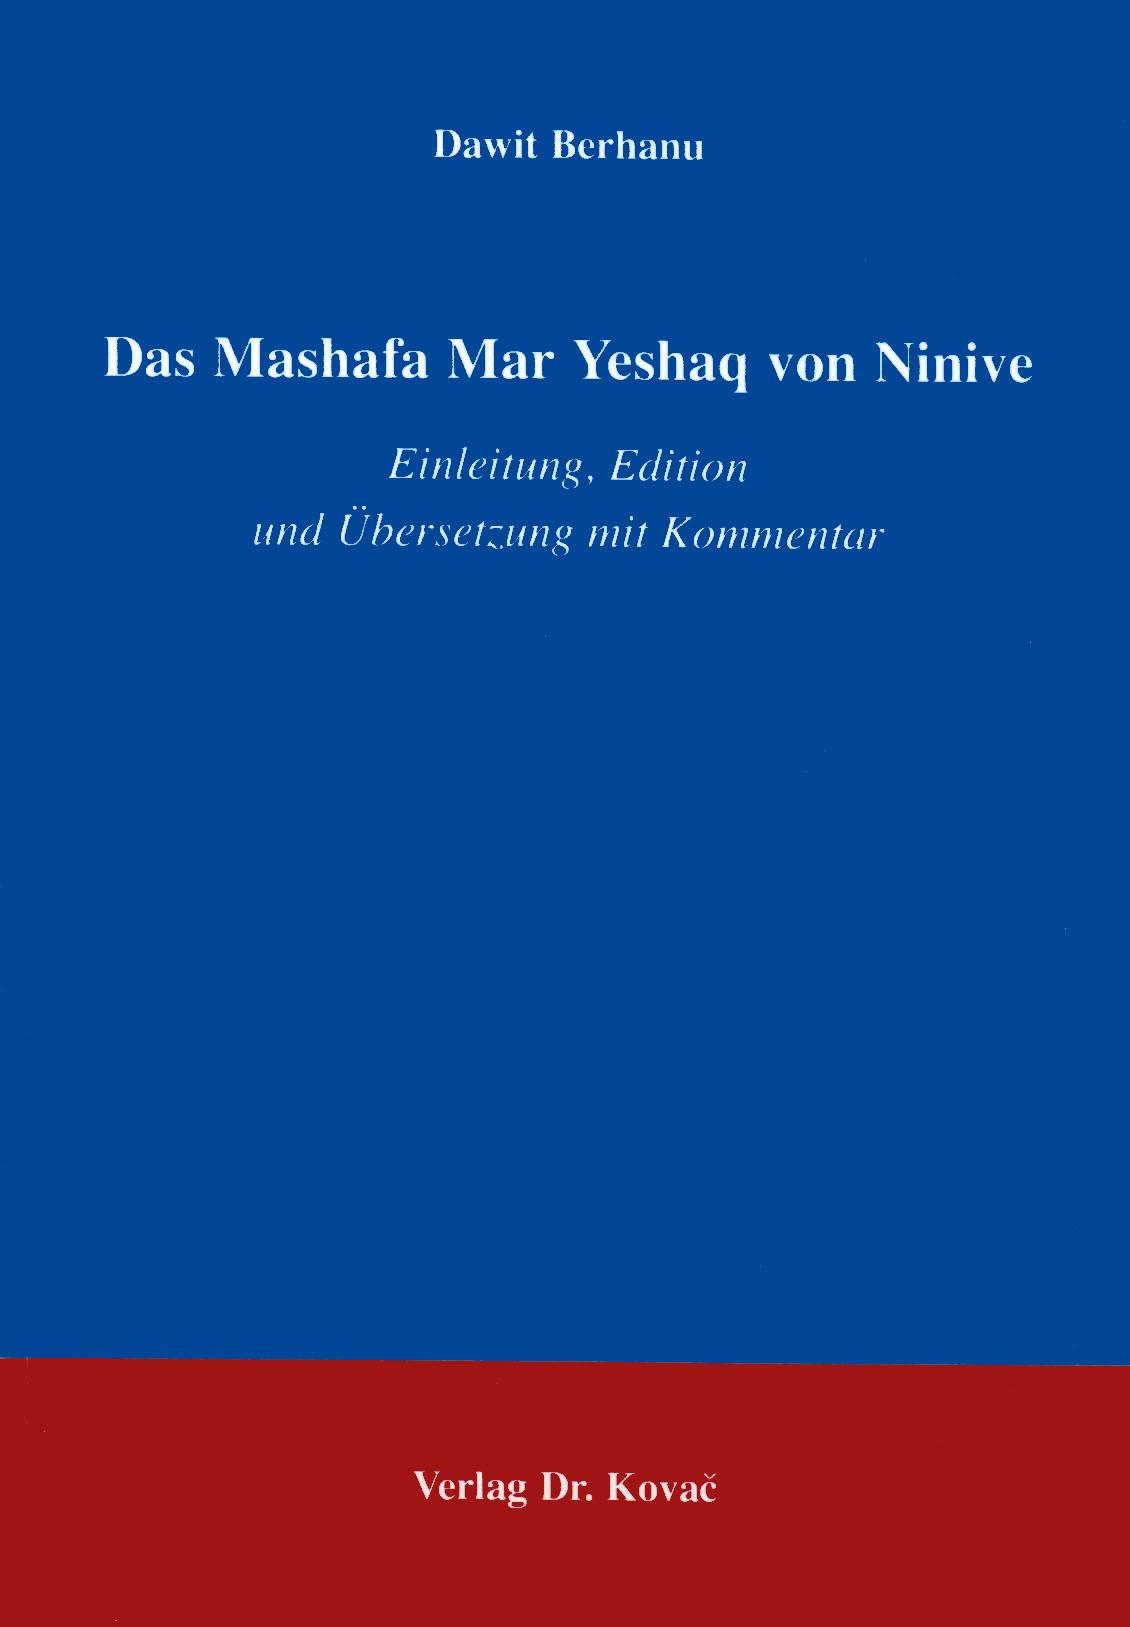 Cover: Das Mashafa Mar Yeshaq von Ninive